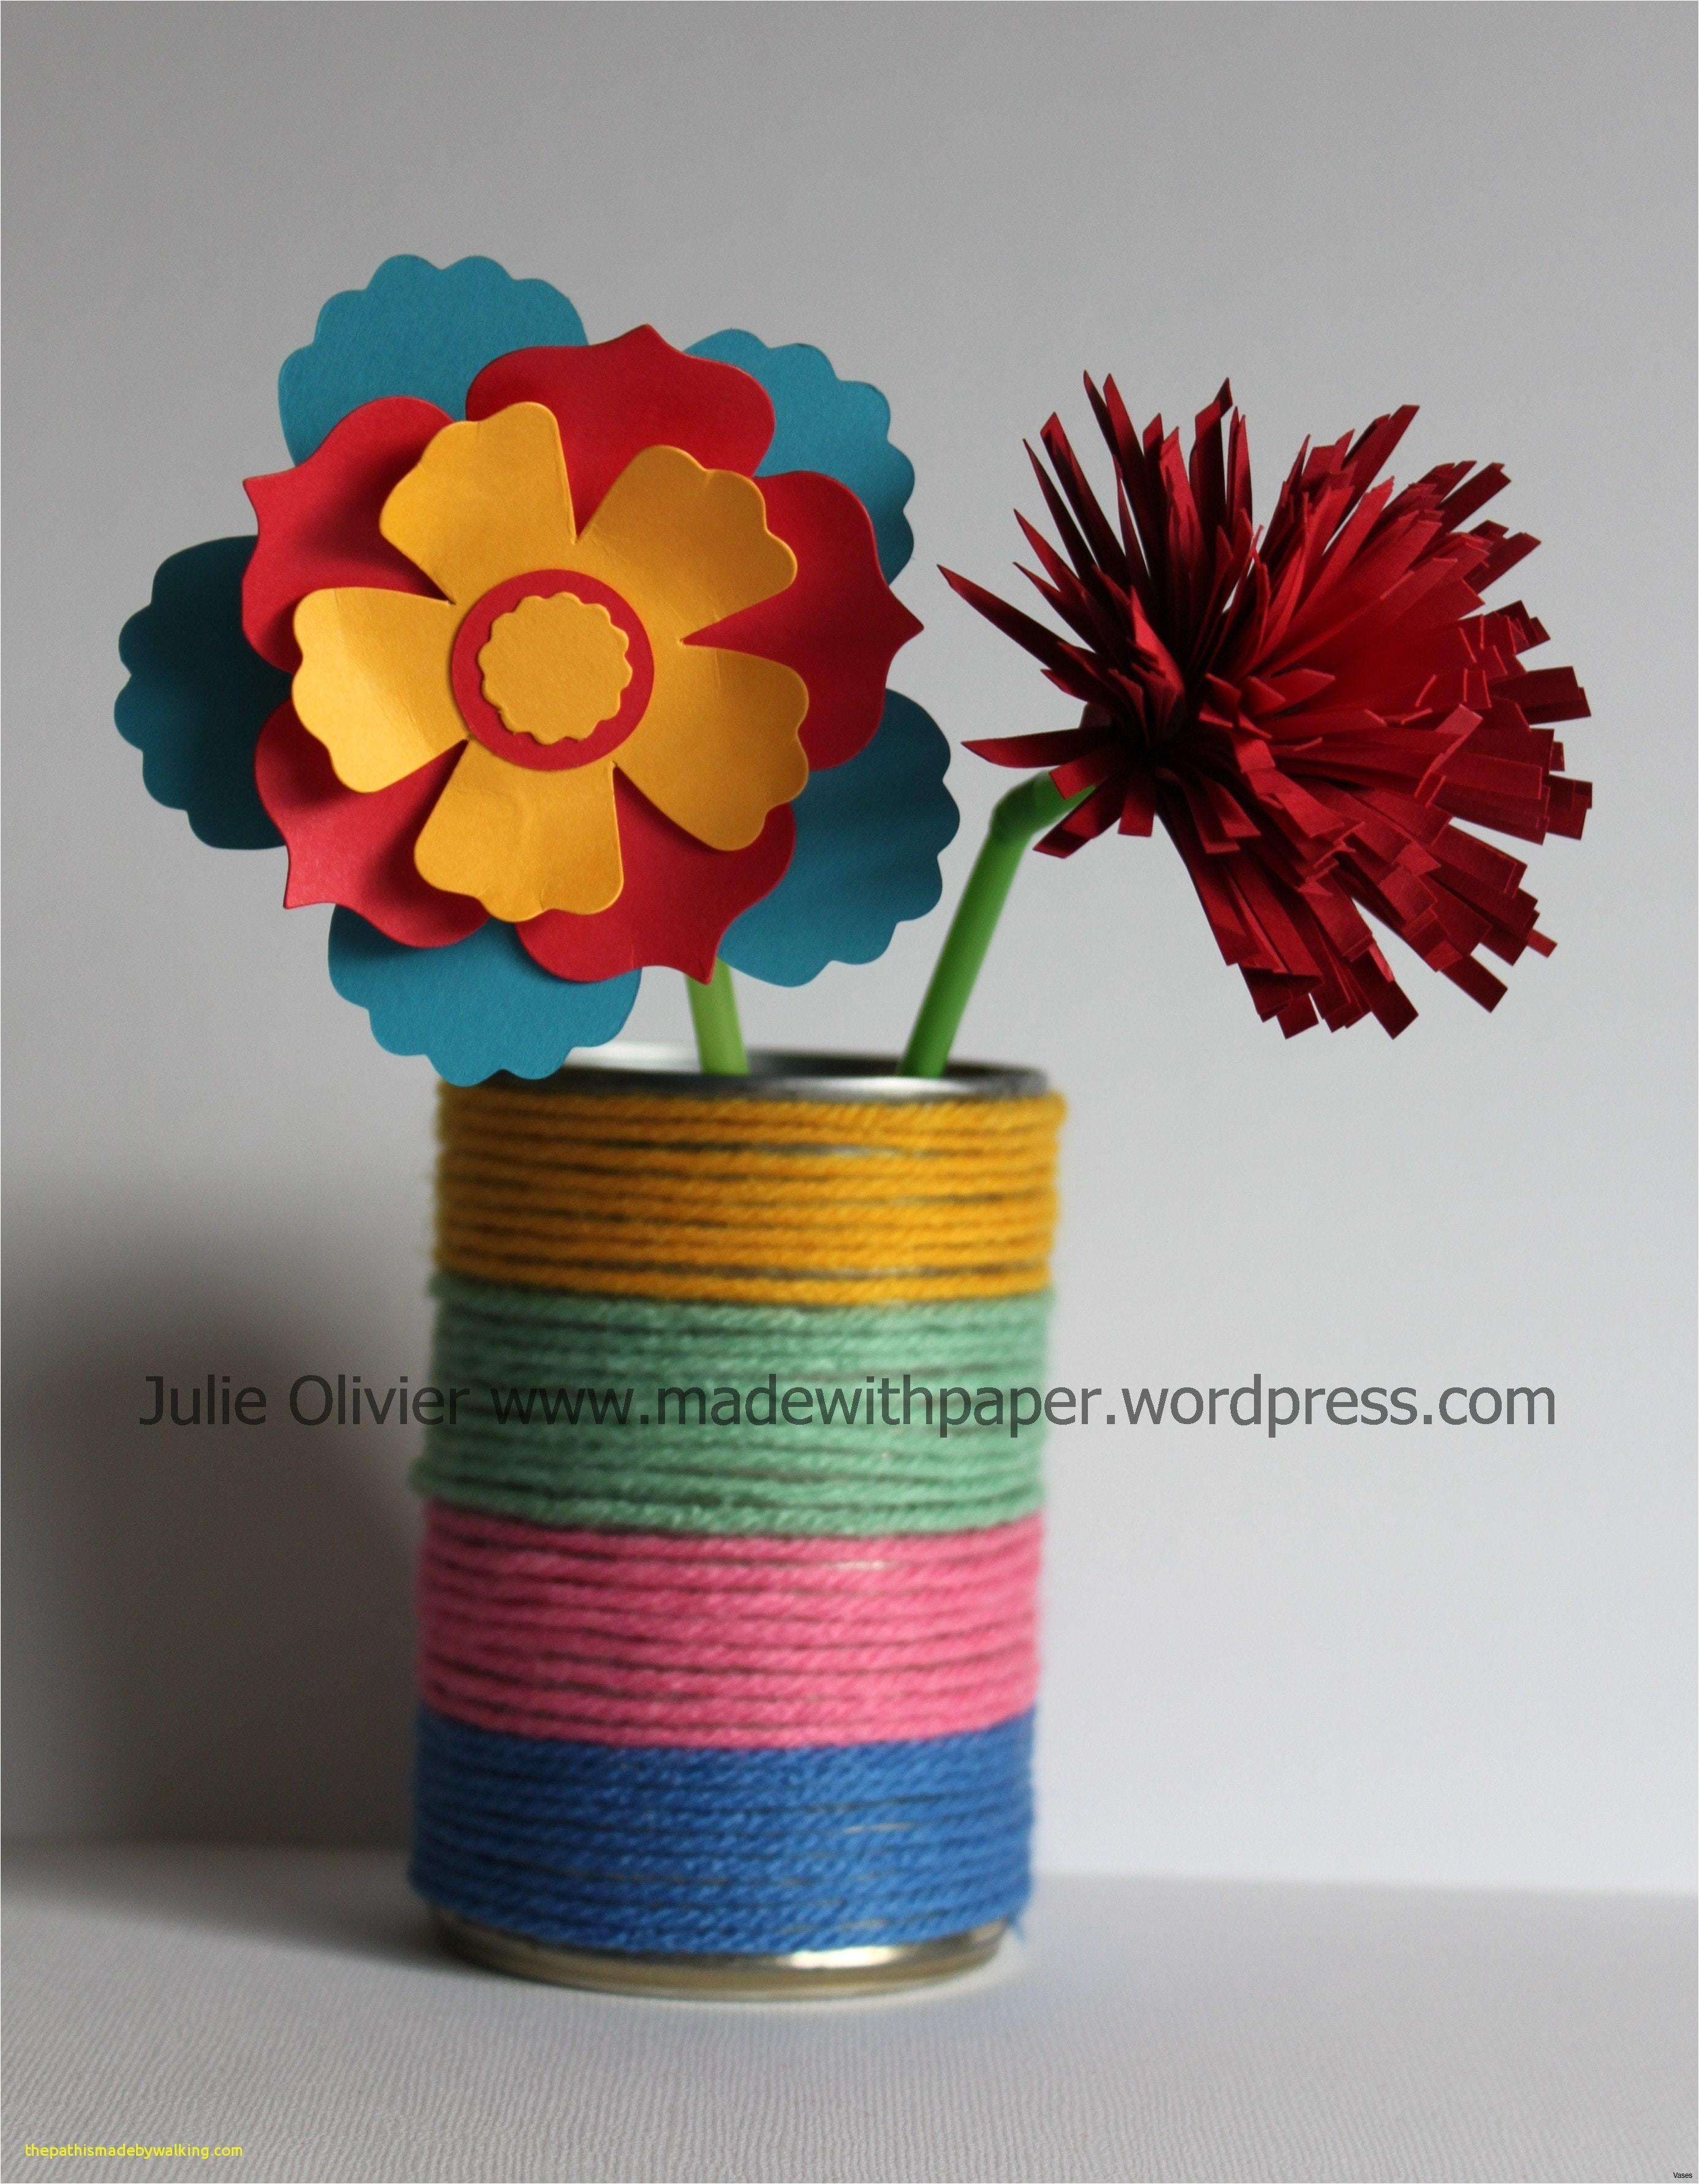 Papercraft Diy Beautiful Papercraft Flower Vase thepathismadebywalking